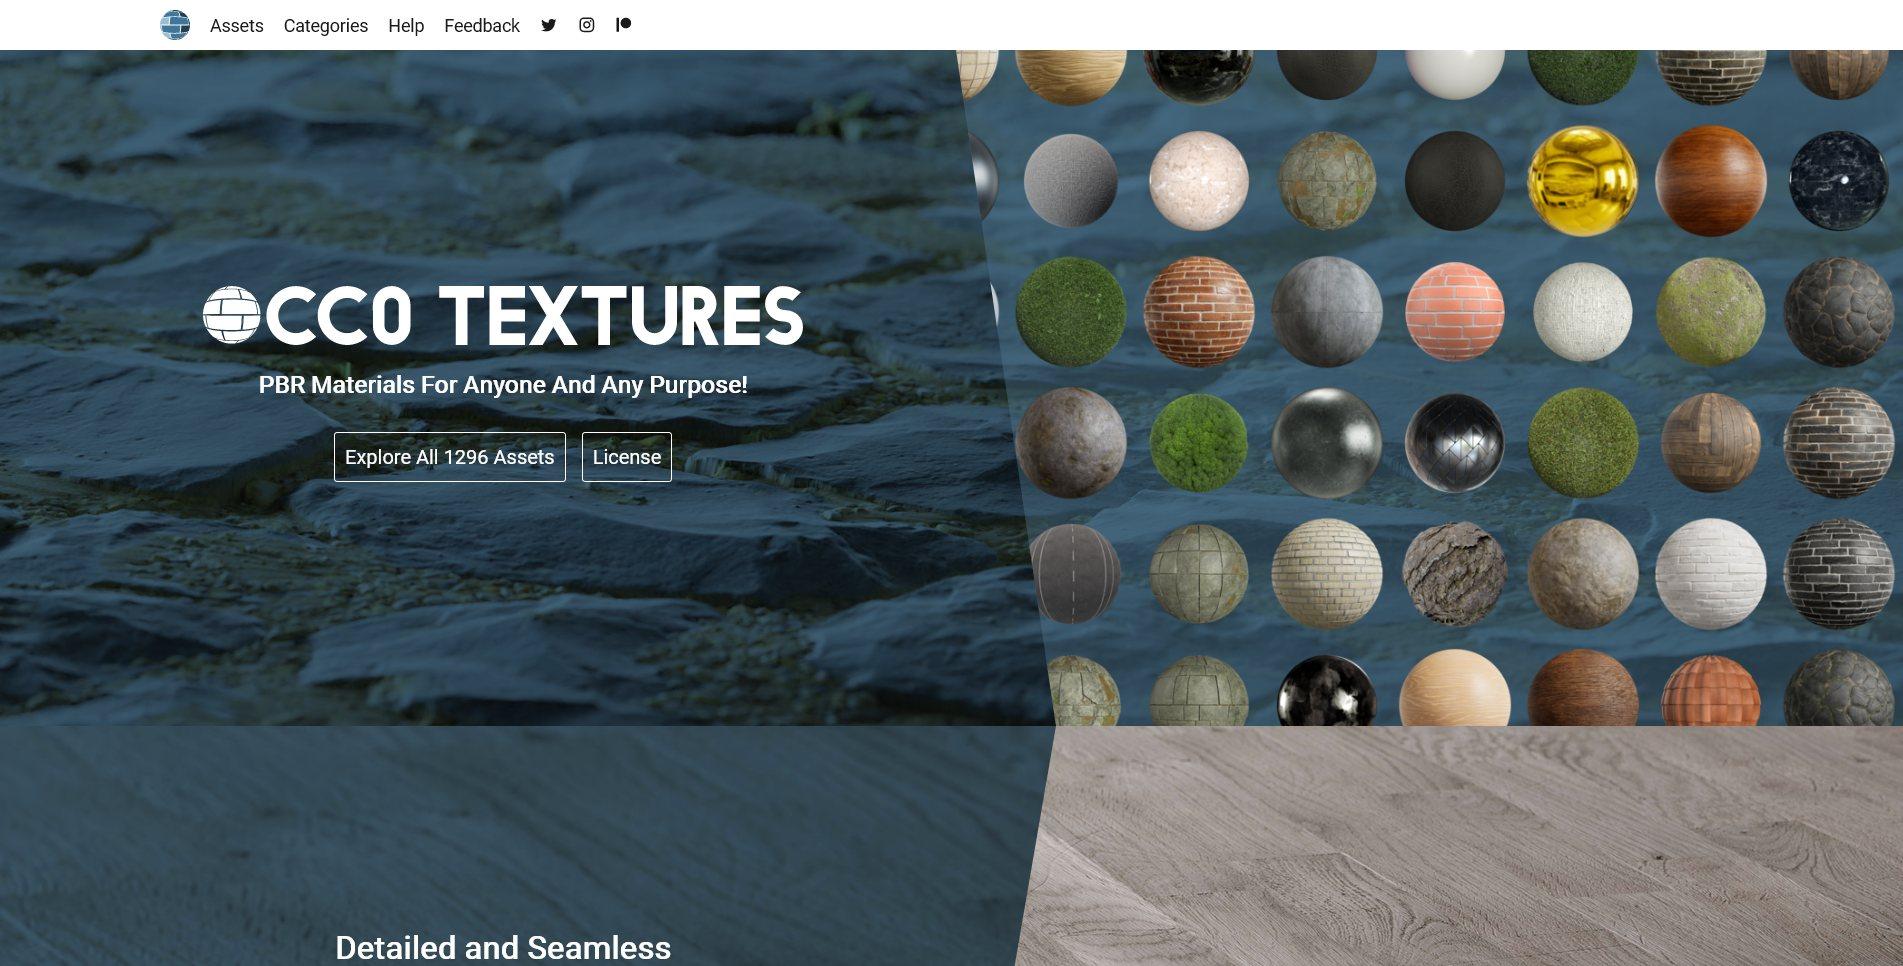 Texture Site Screenshot of CC0 Textures